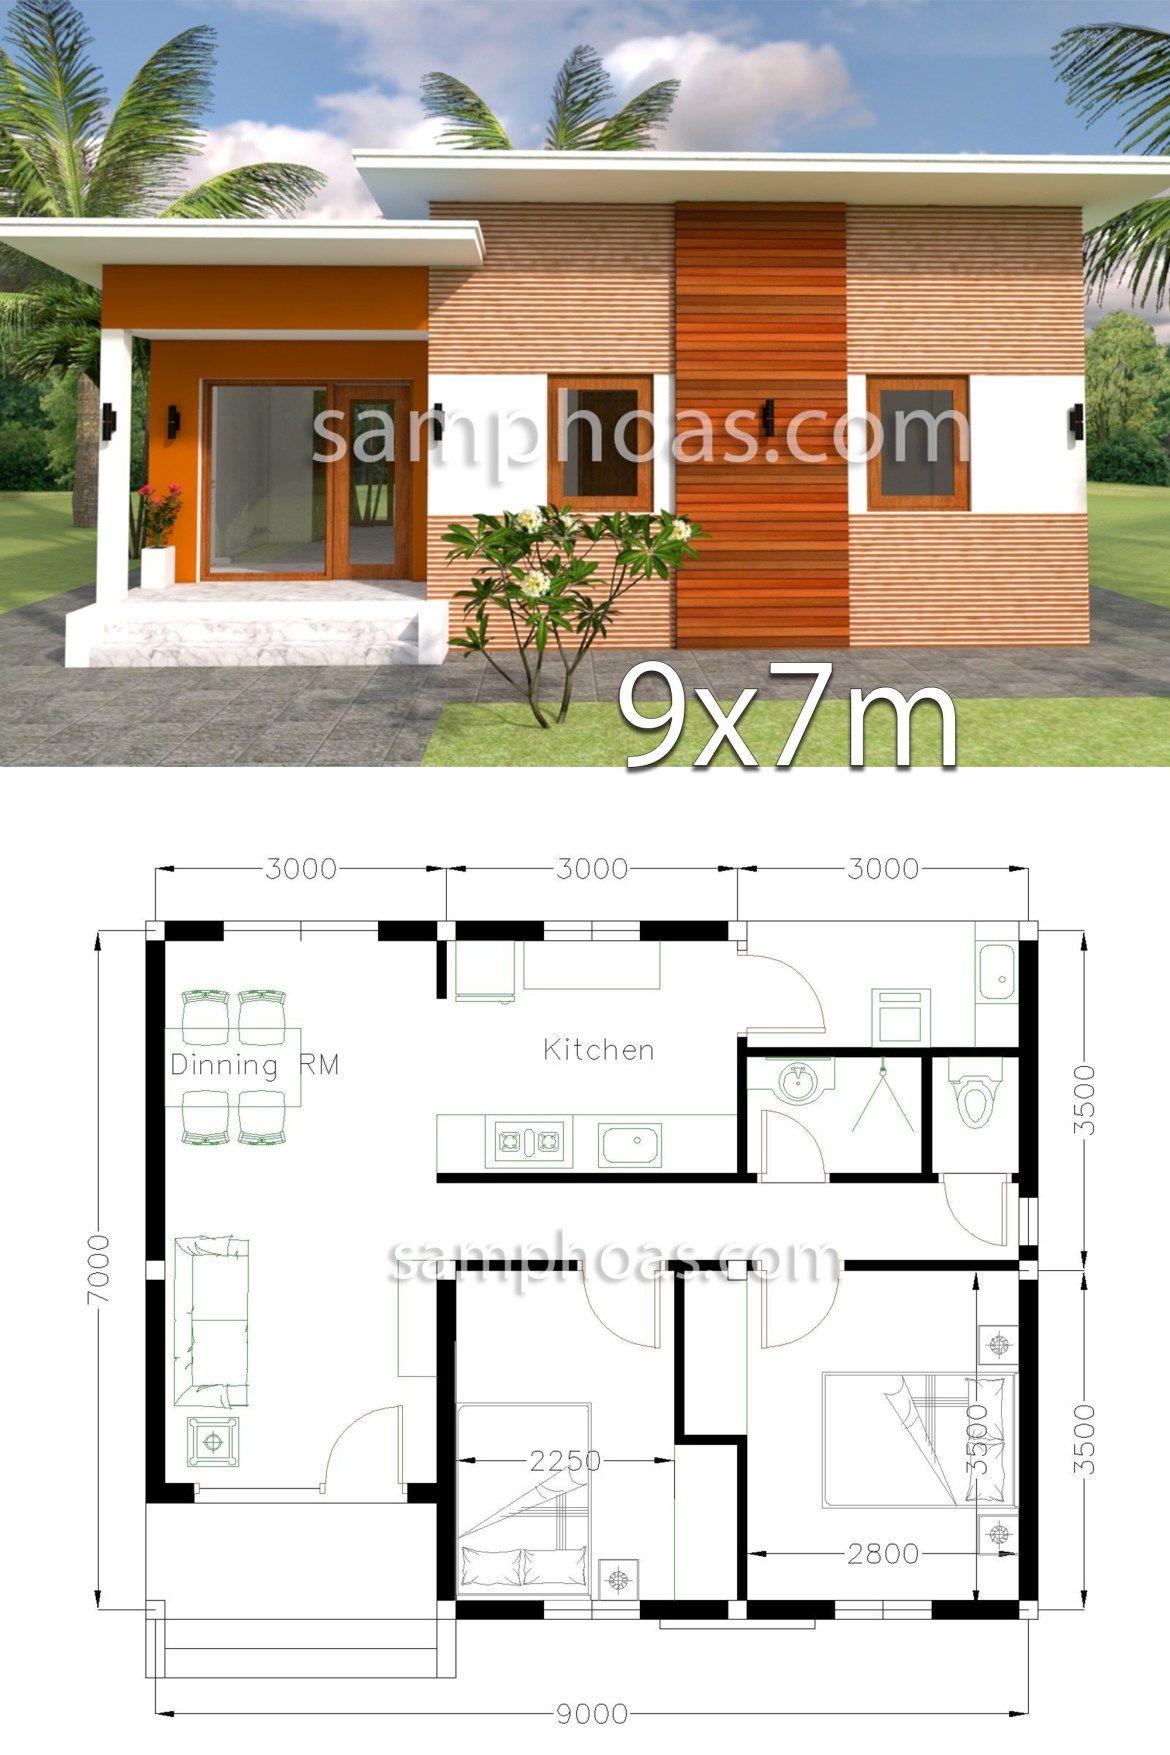 Plan 3d home design 9x7m 2 bedrooms samphoas plansearch